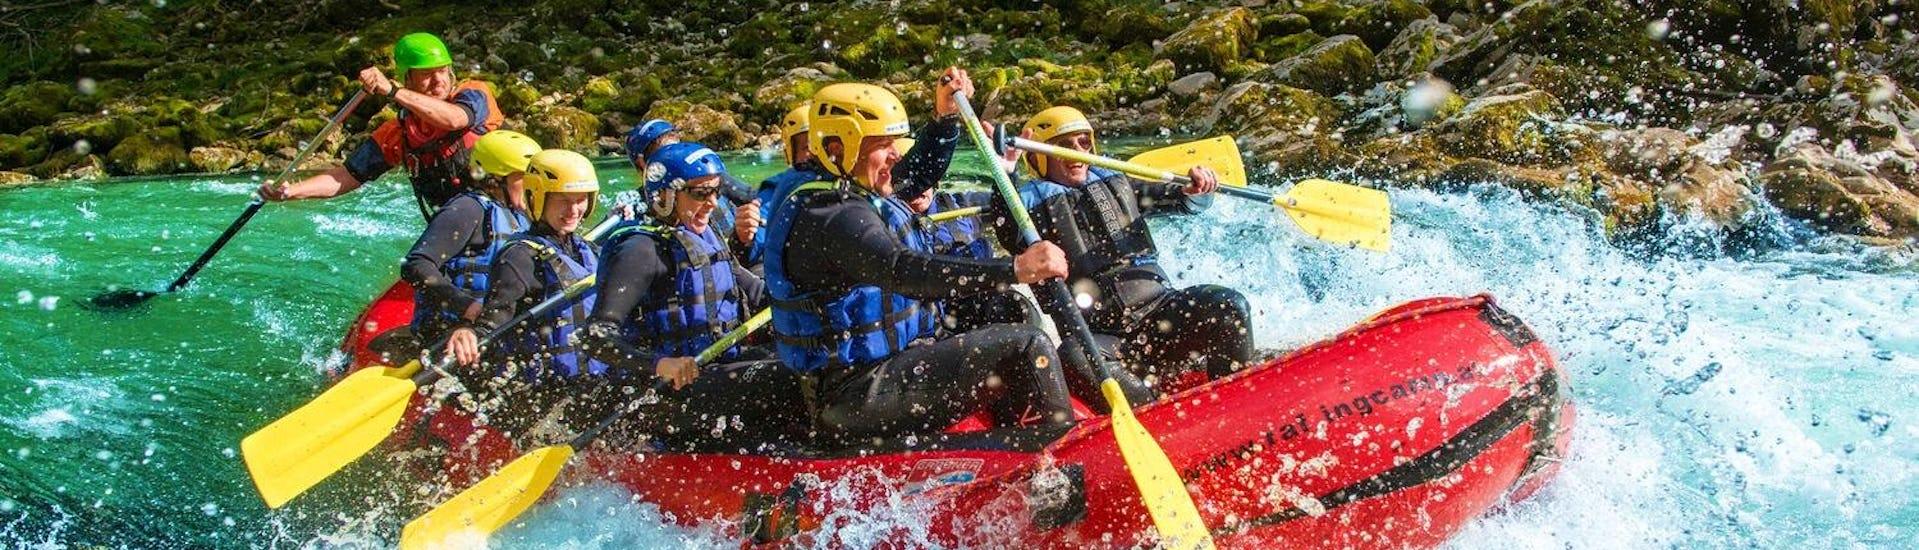 Rafting on the Salza - Half-Day Tour